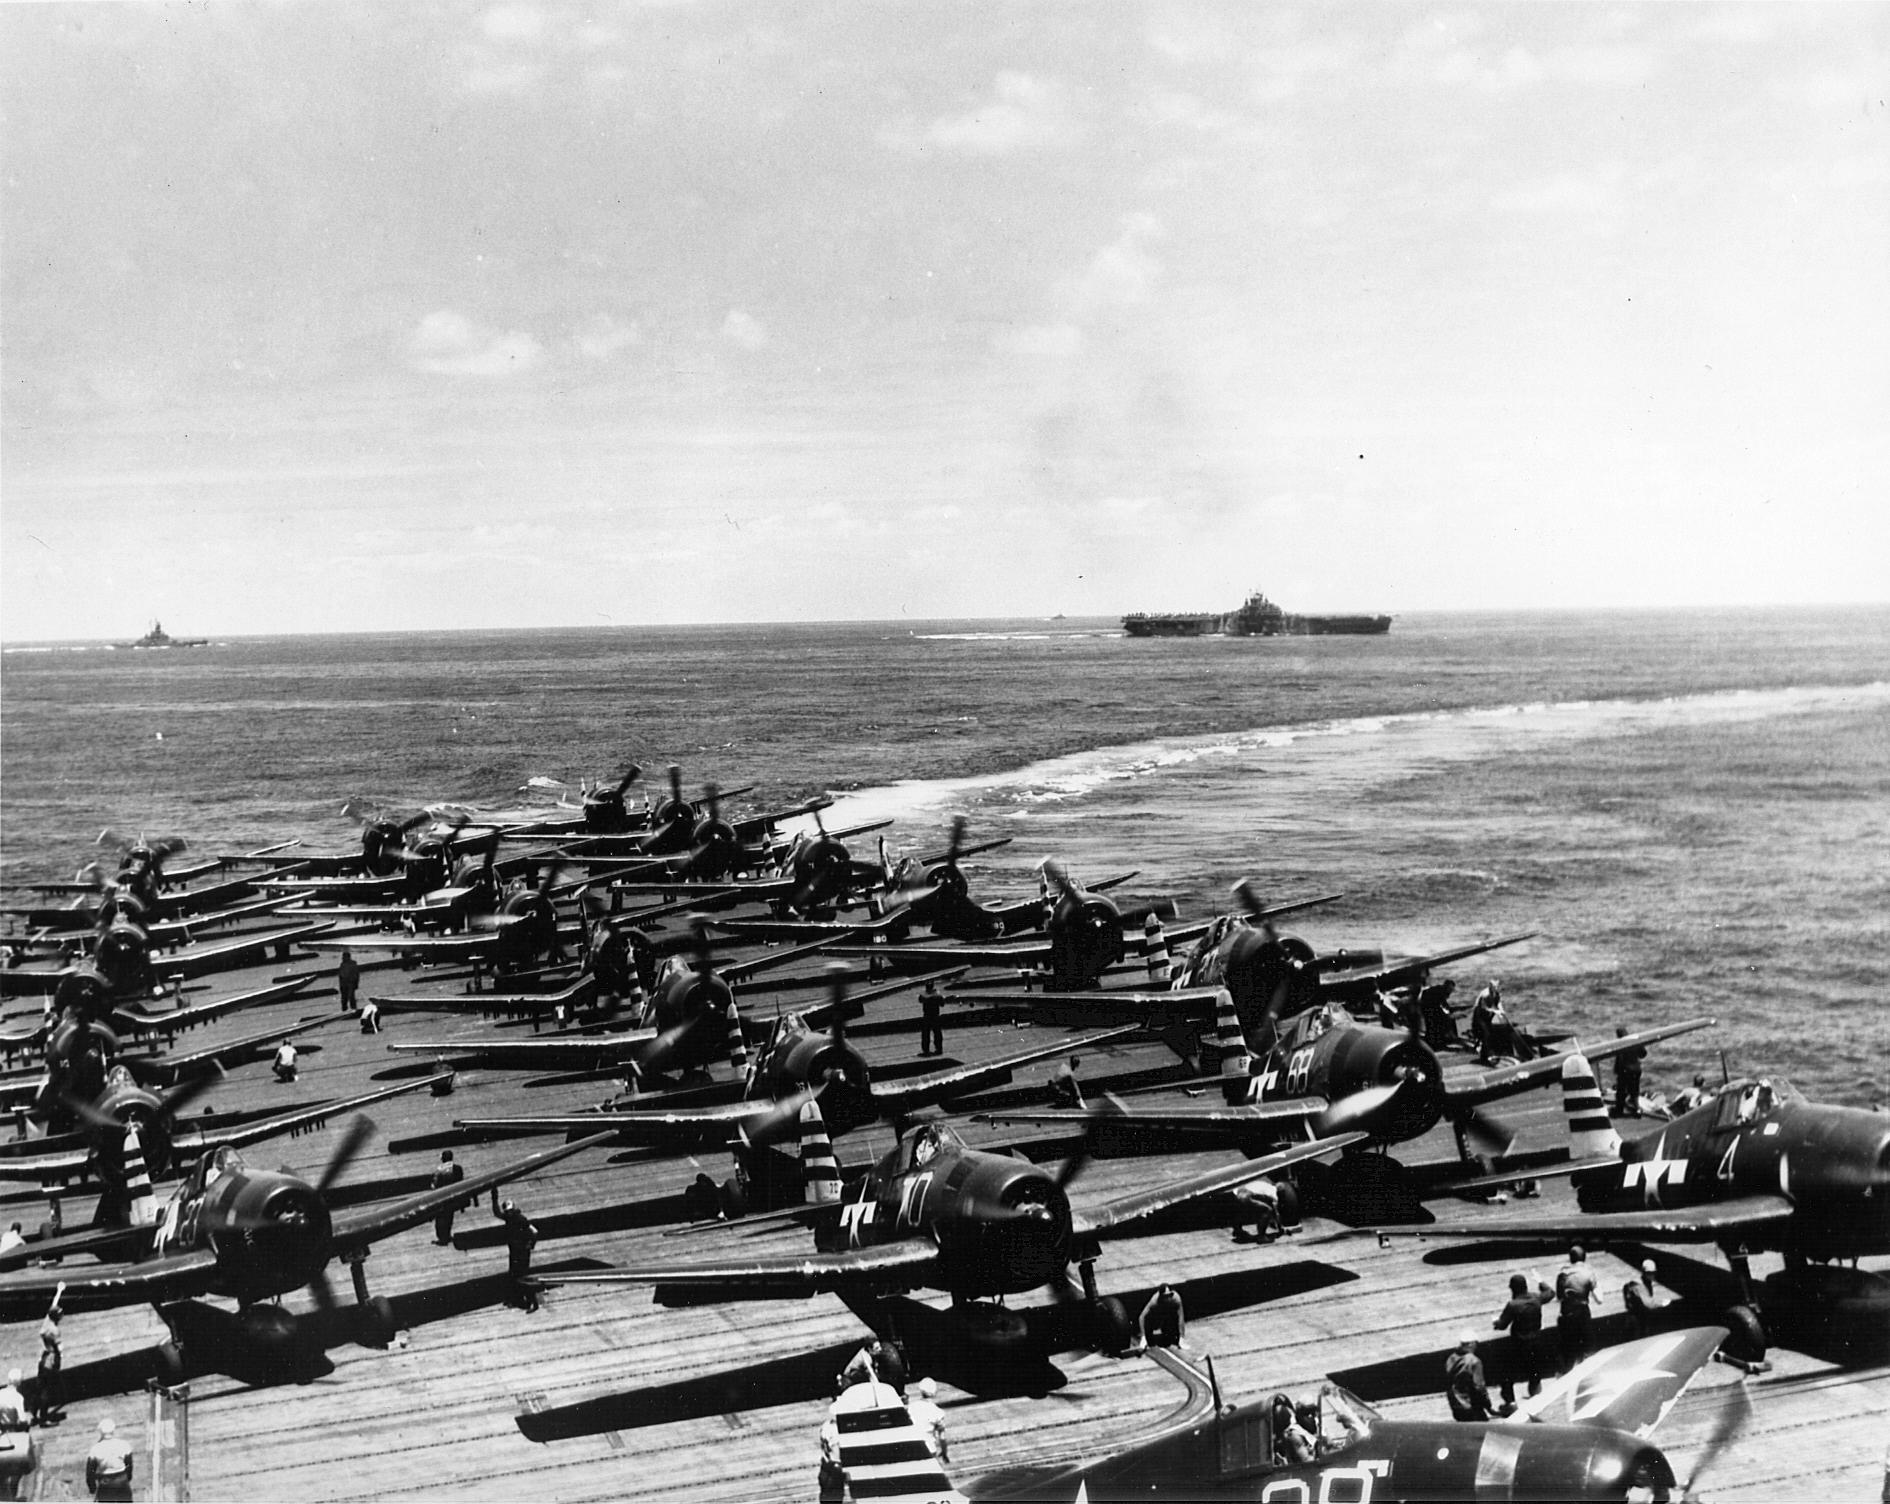 Grumman F6F 5 Hellcat VF 12 White 4,23 and 68 warming up CV 15 USS Randolp 01